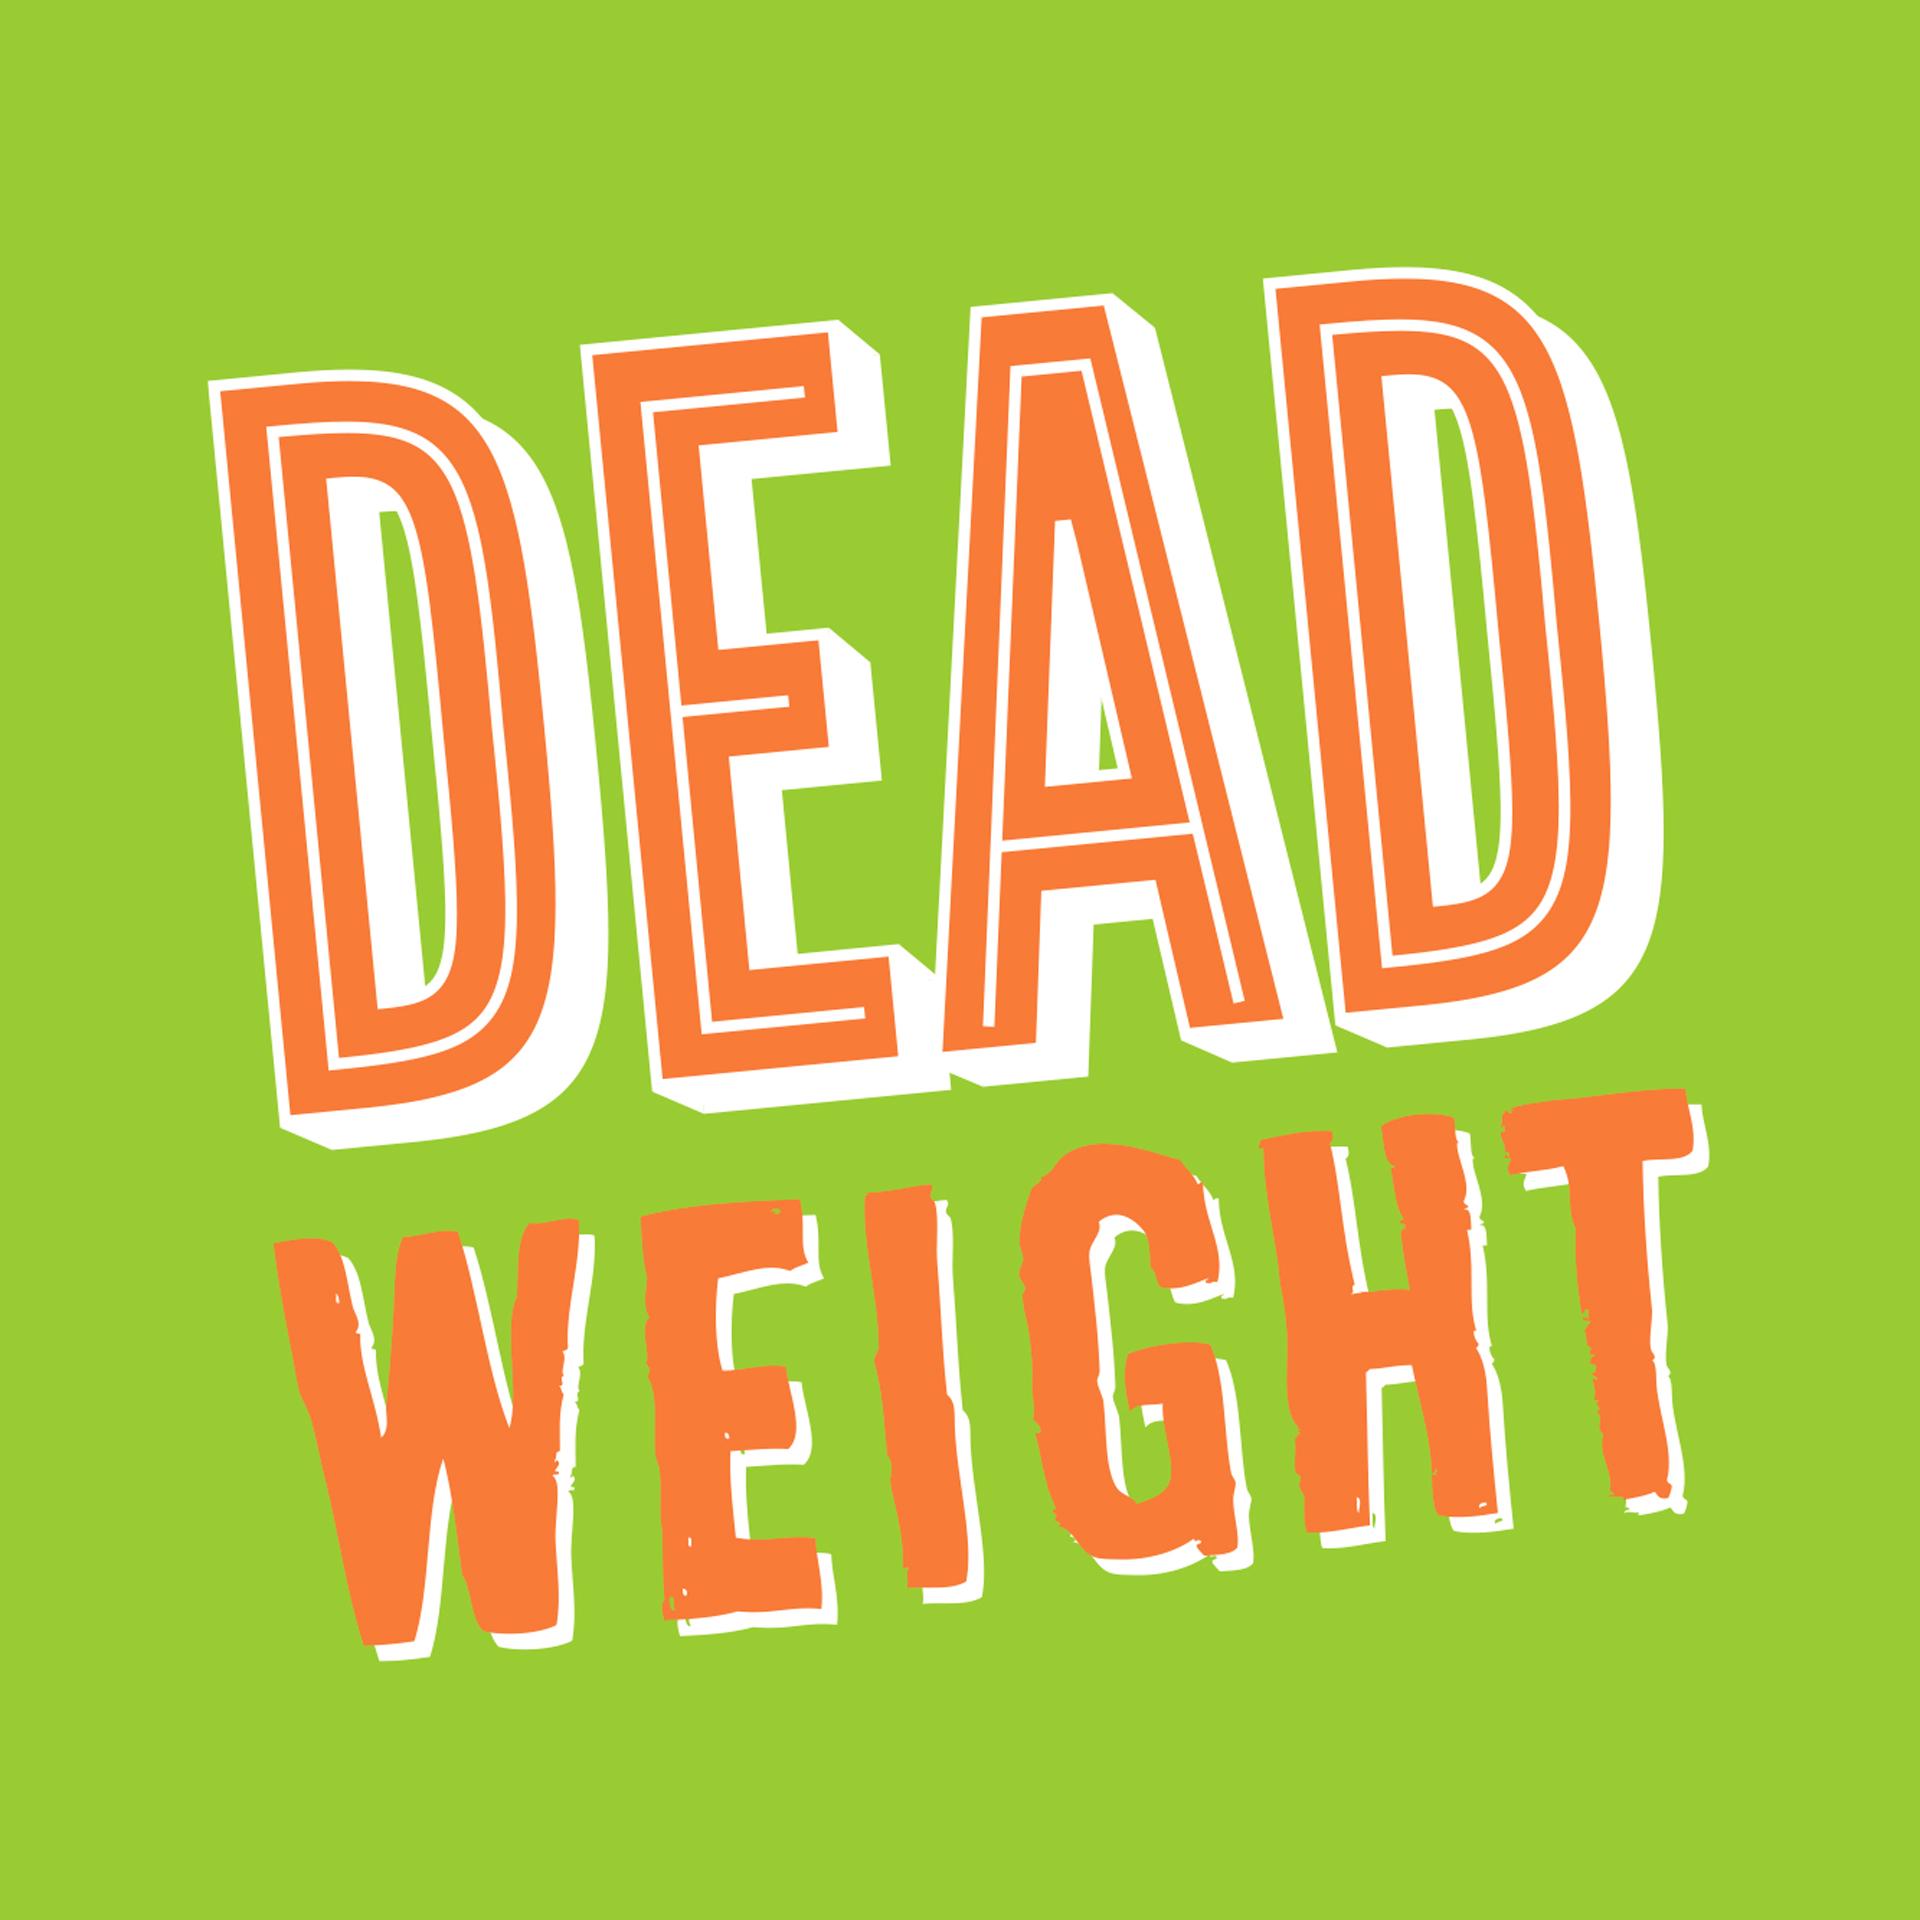 Dead Weight: Awareness Campaign Branding